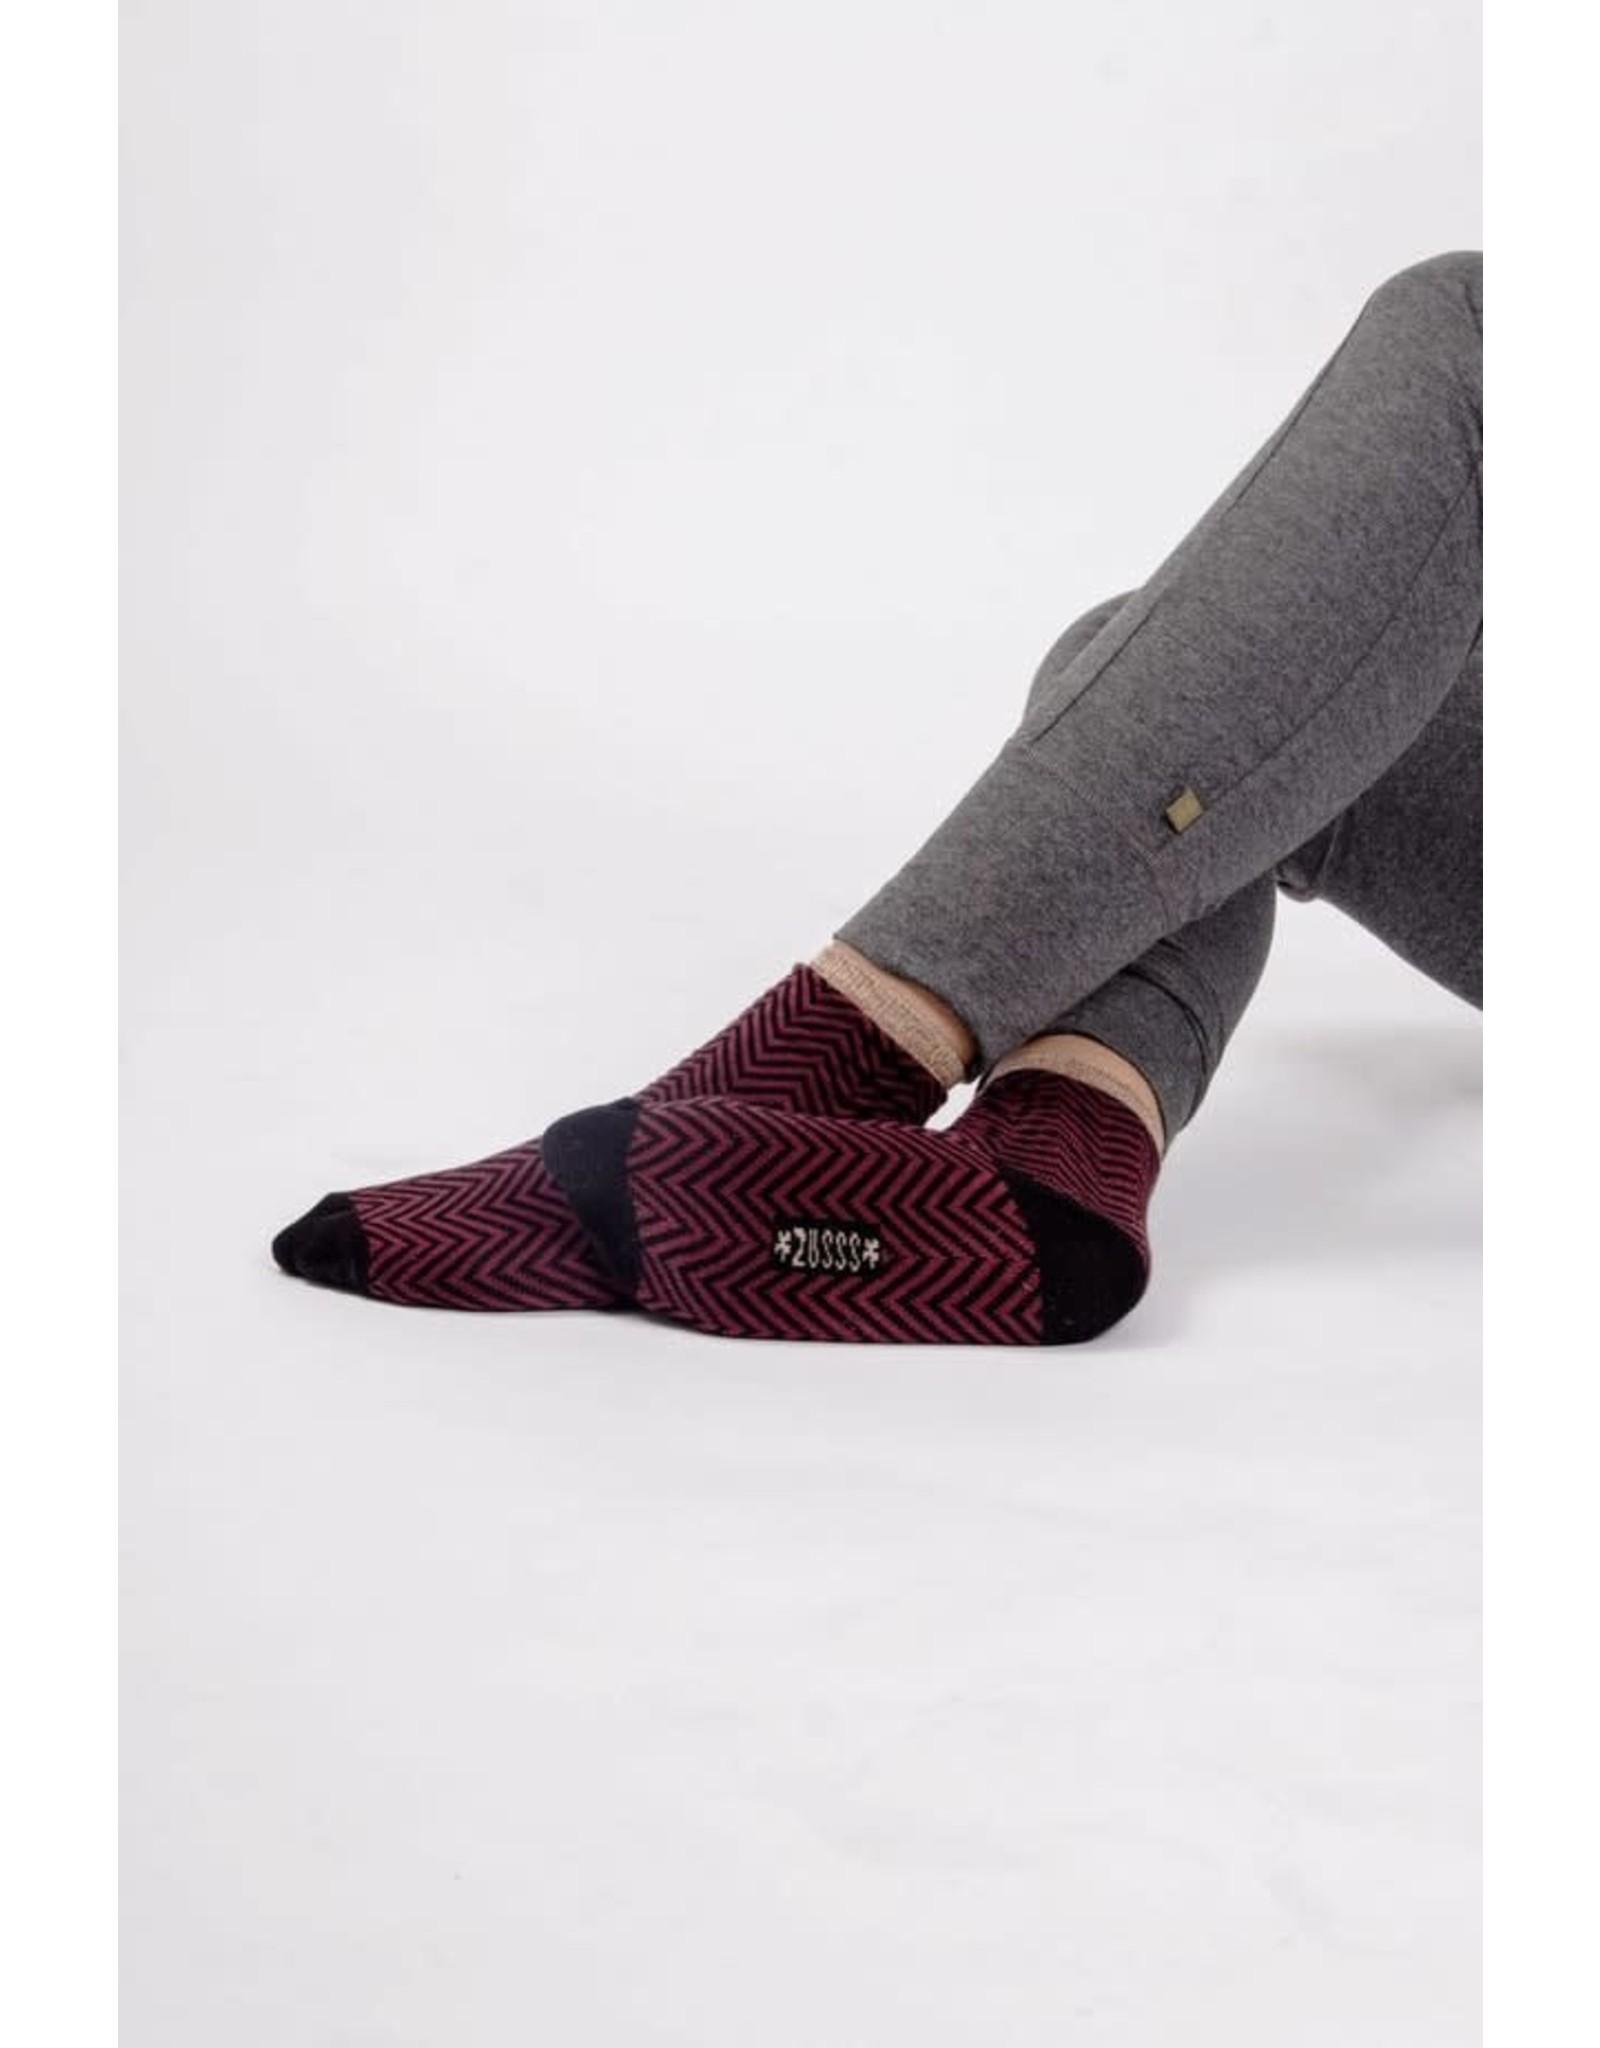 Zusss Zusss Sjieke sokken Aubergine